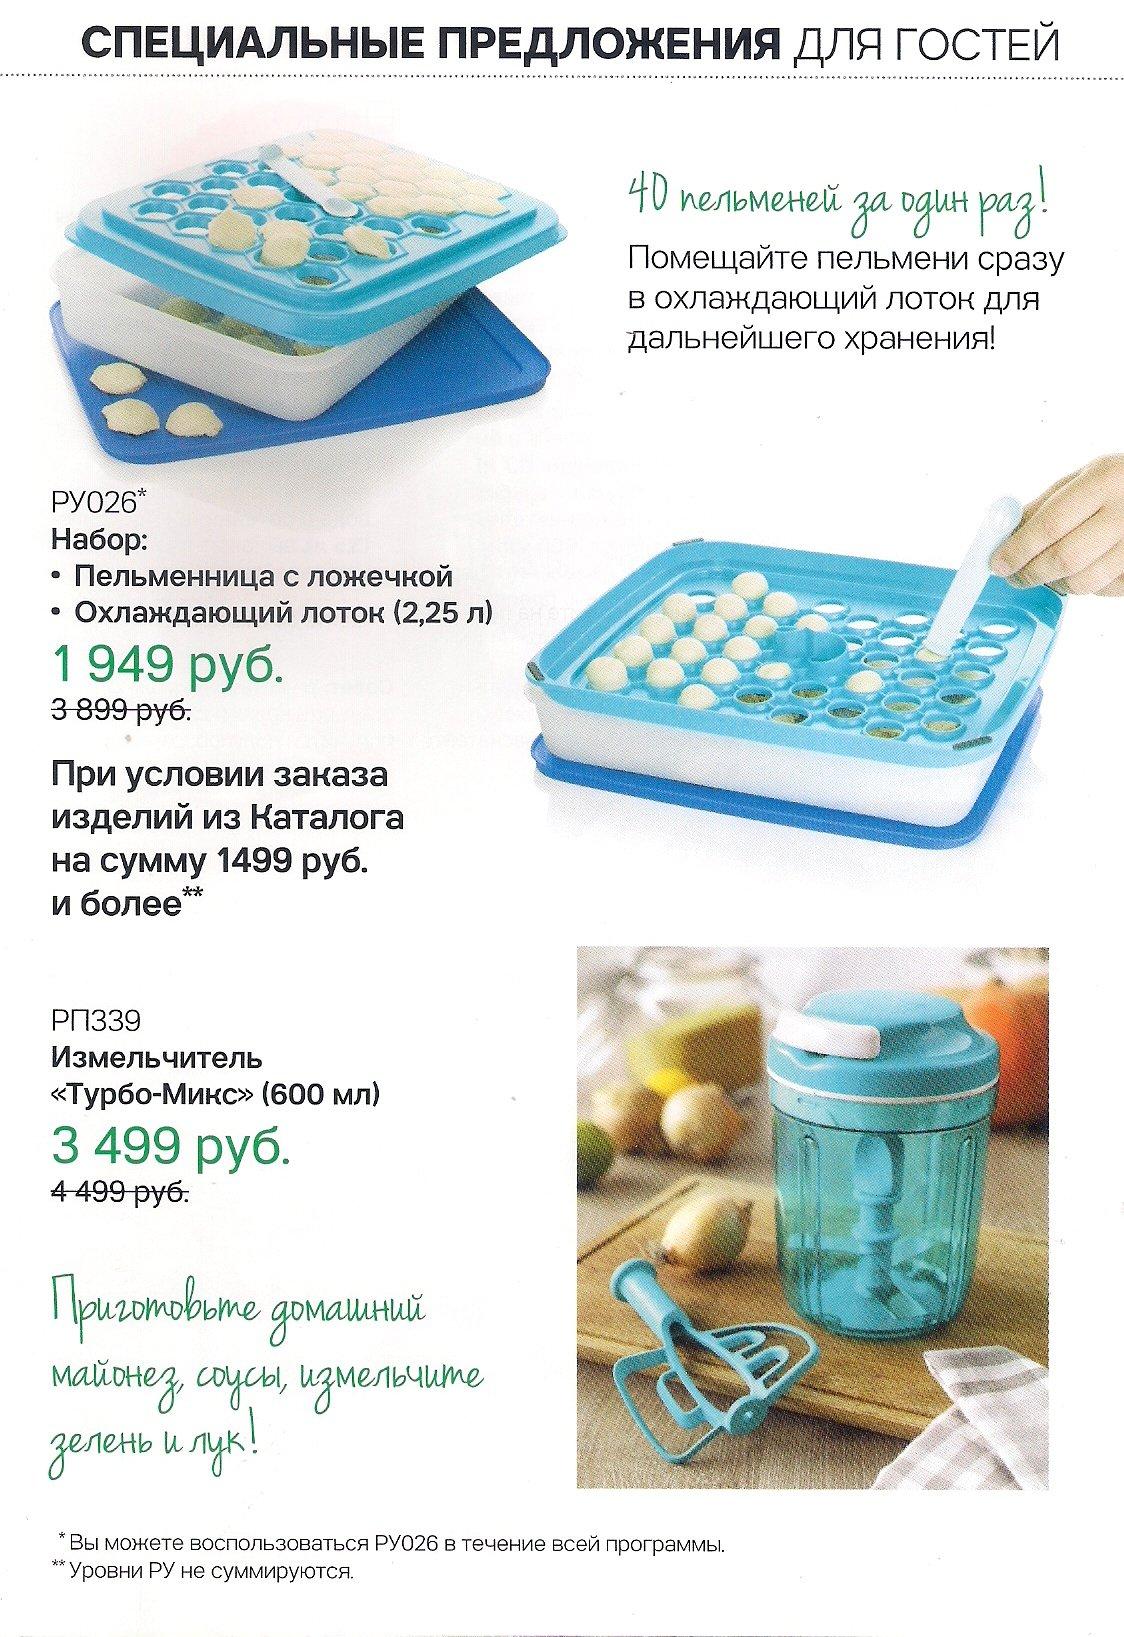 https://tupperware-online.ru/images/upload/3d.jpg